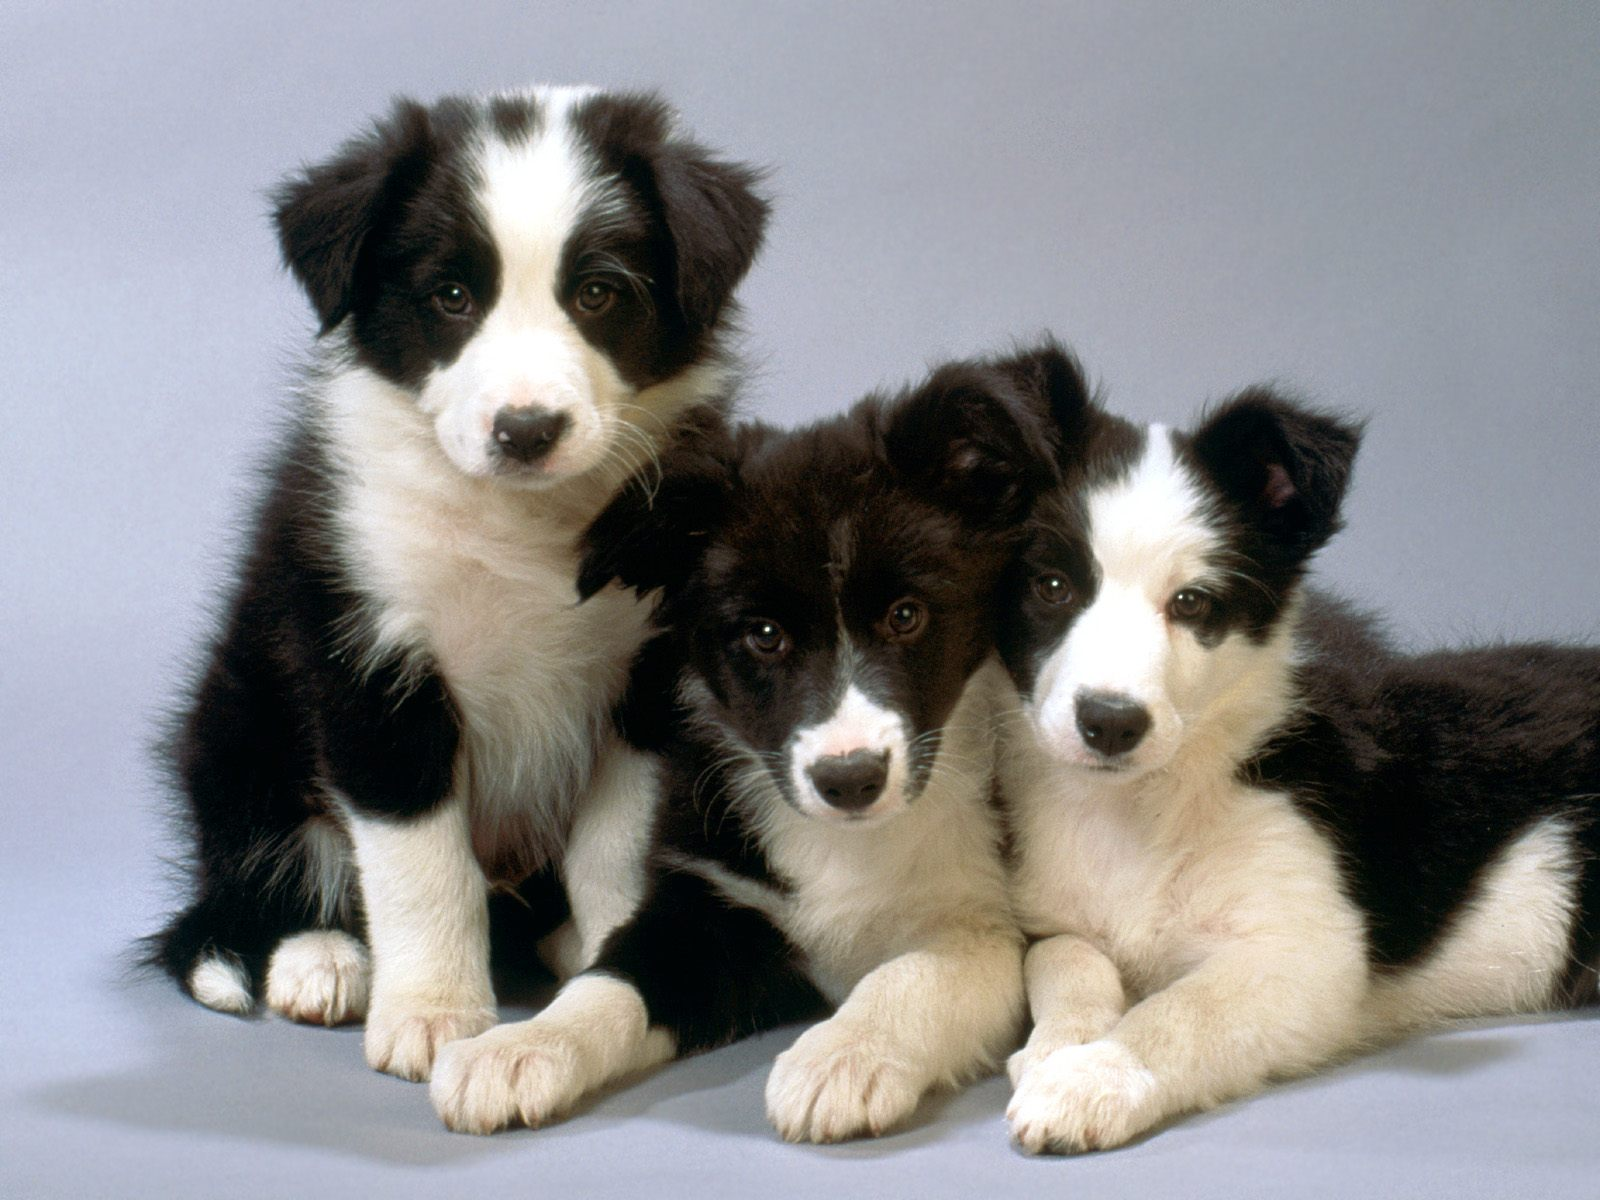 http://1.bp.blogspot.com/-RVQPVje8hV4/T6S8ebKjAHI/AAAAAAAAAME/4GN5P3RTsGI/s1600/anjing+lucu+2.jpg